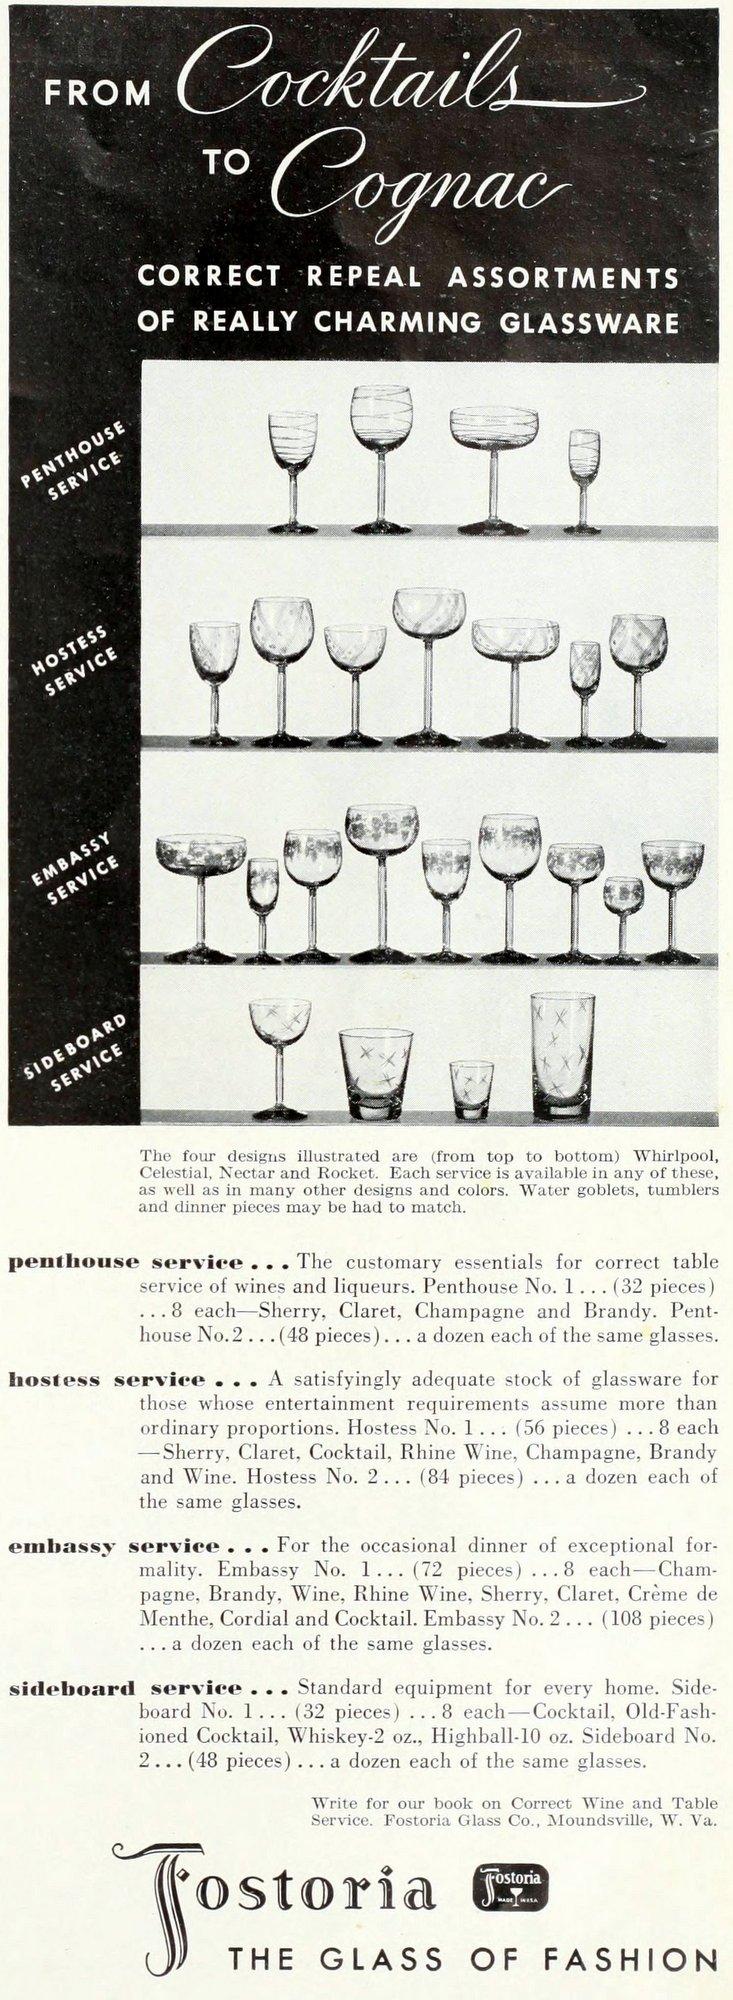 Old Fostoria glasses (1934)